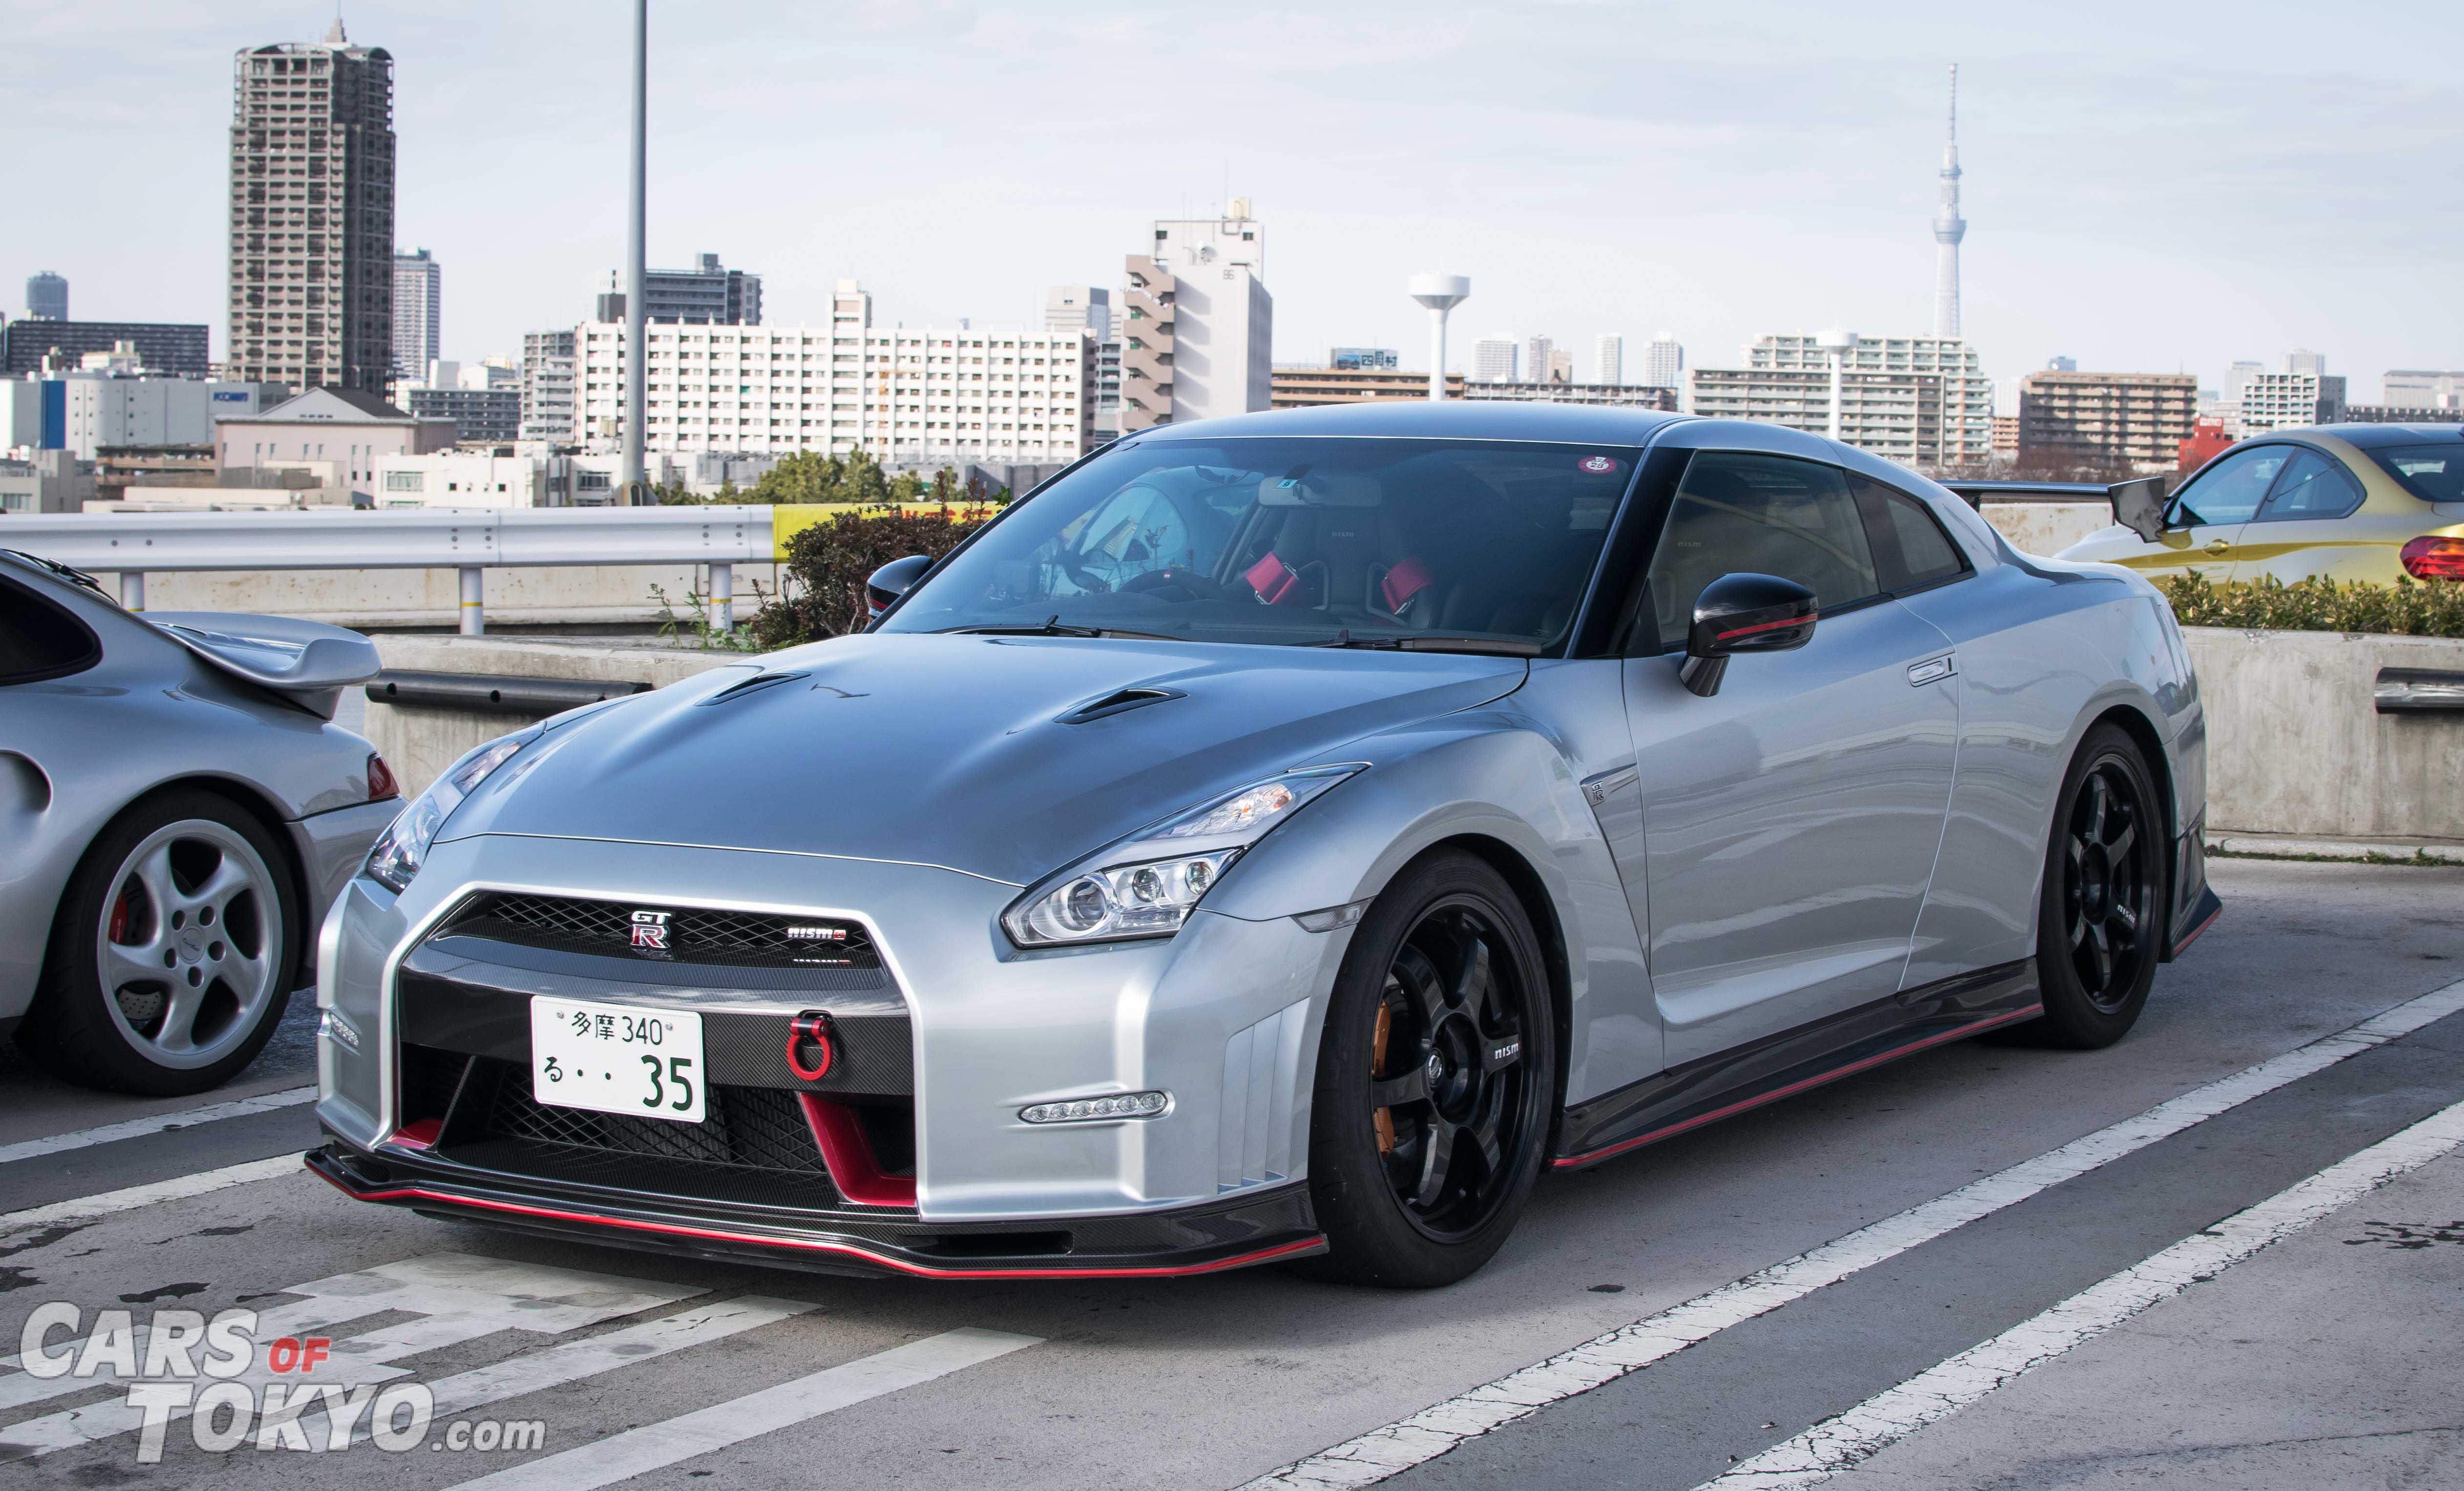 Cars of Tokyo Tatsumi Nissan GT-R NISMO